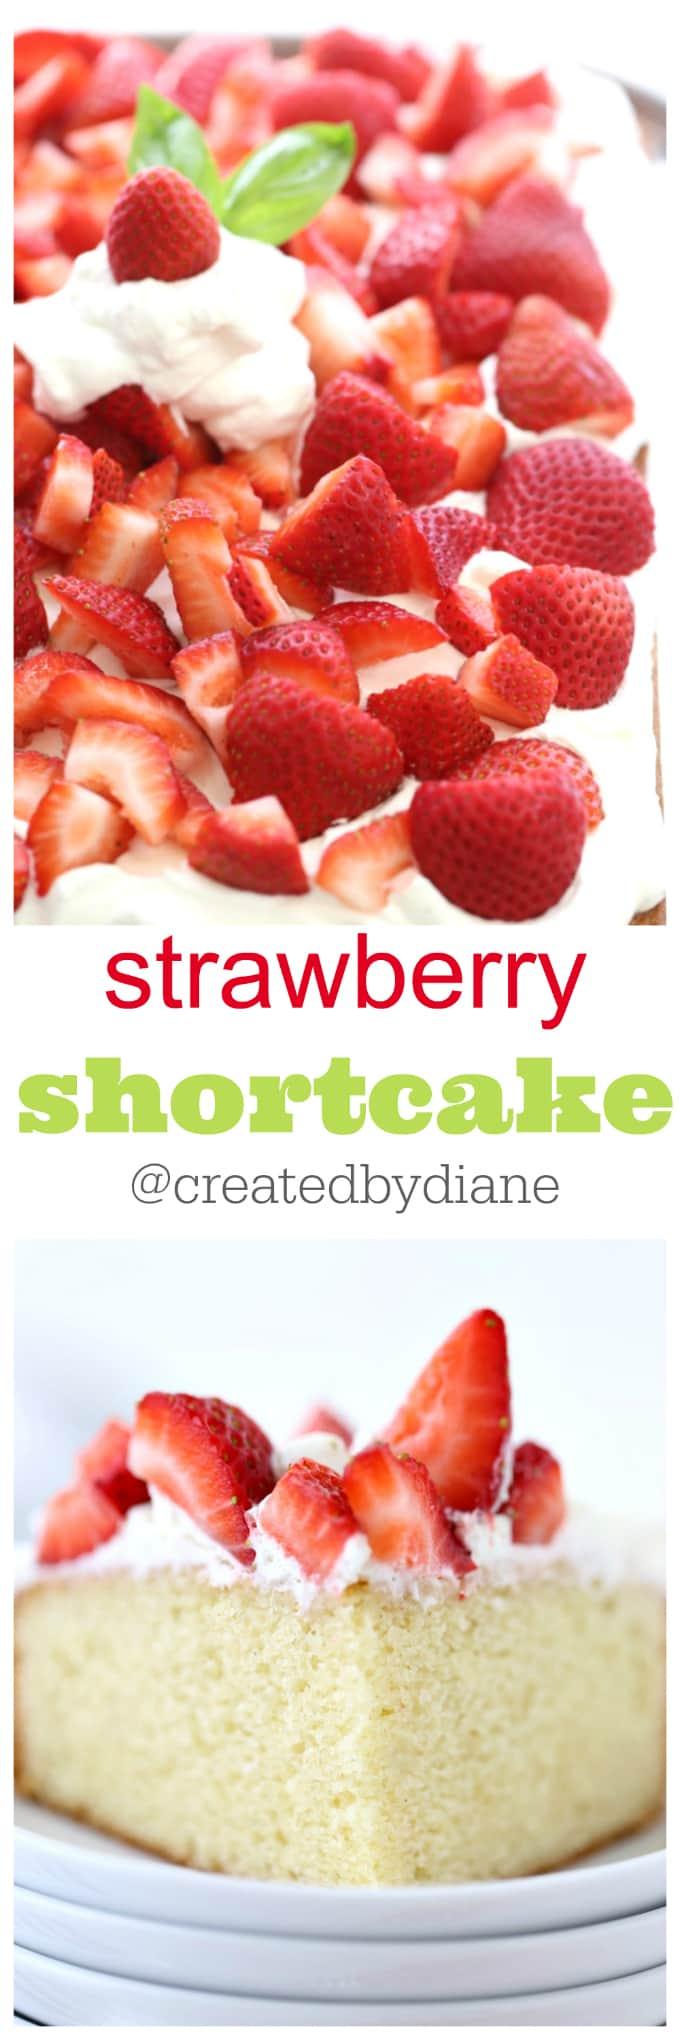 1 hour strawberry shortcake @createdbydiane